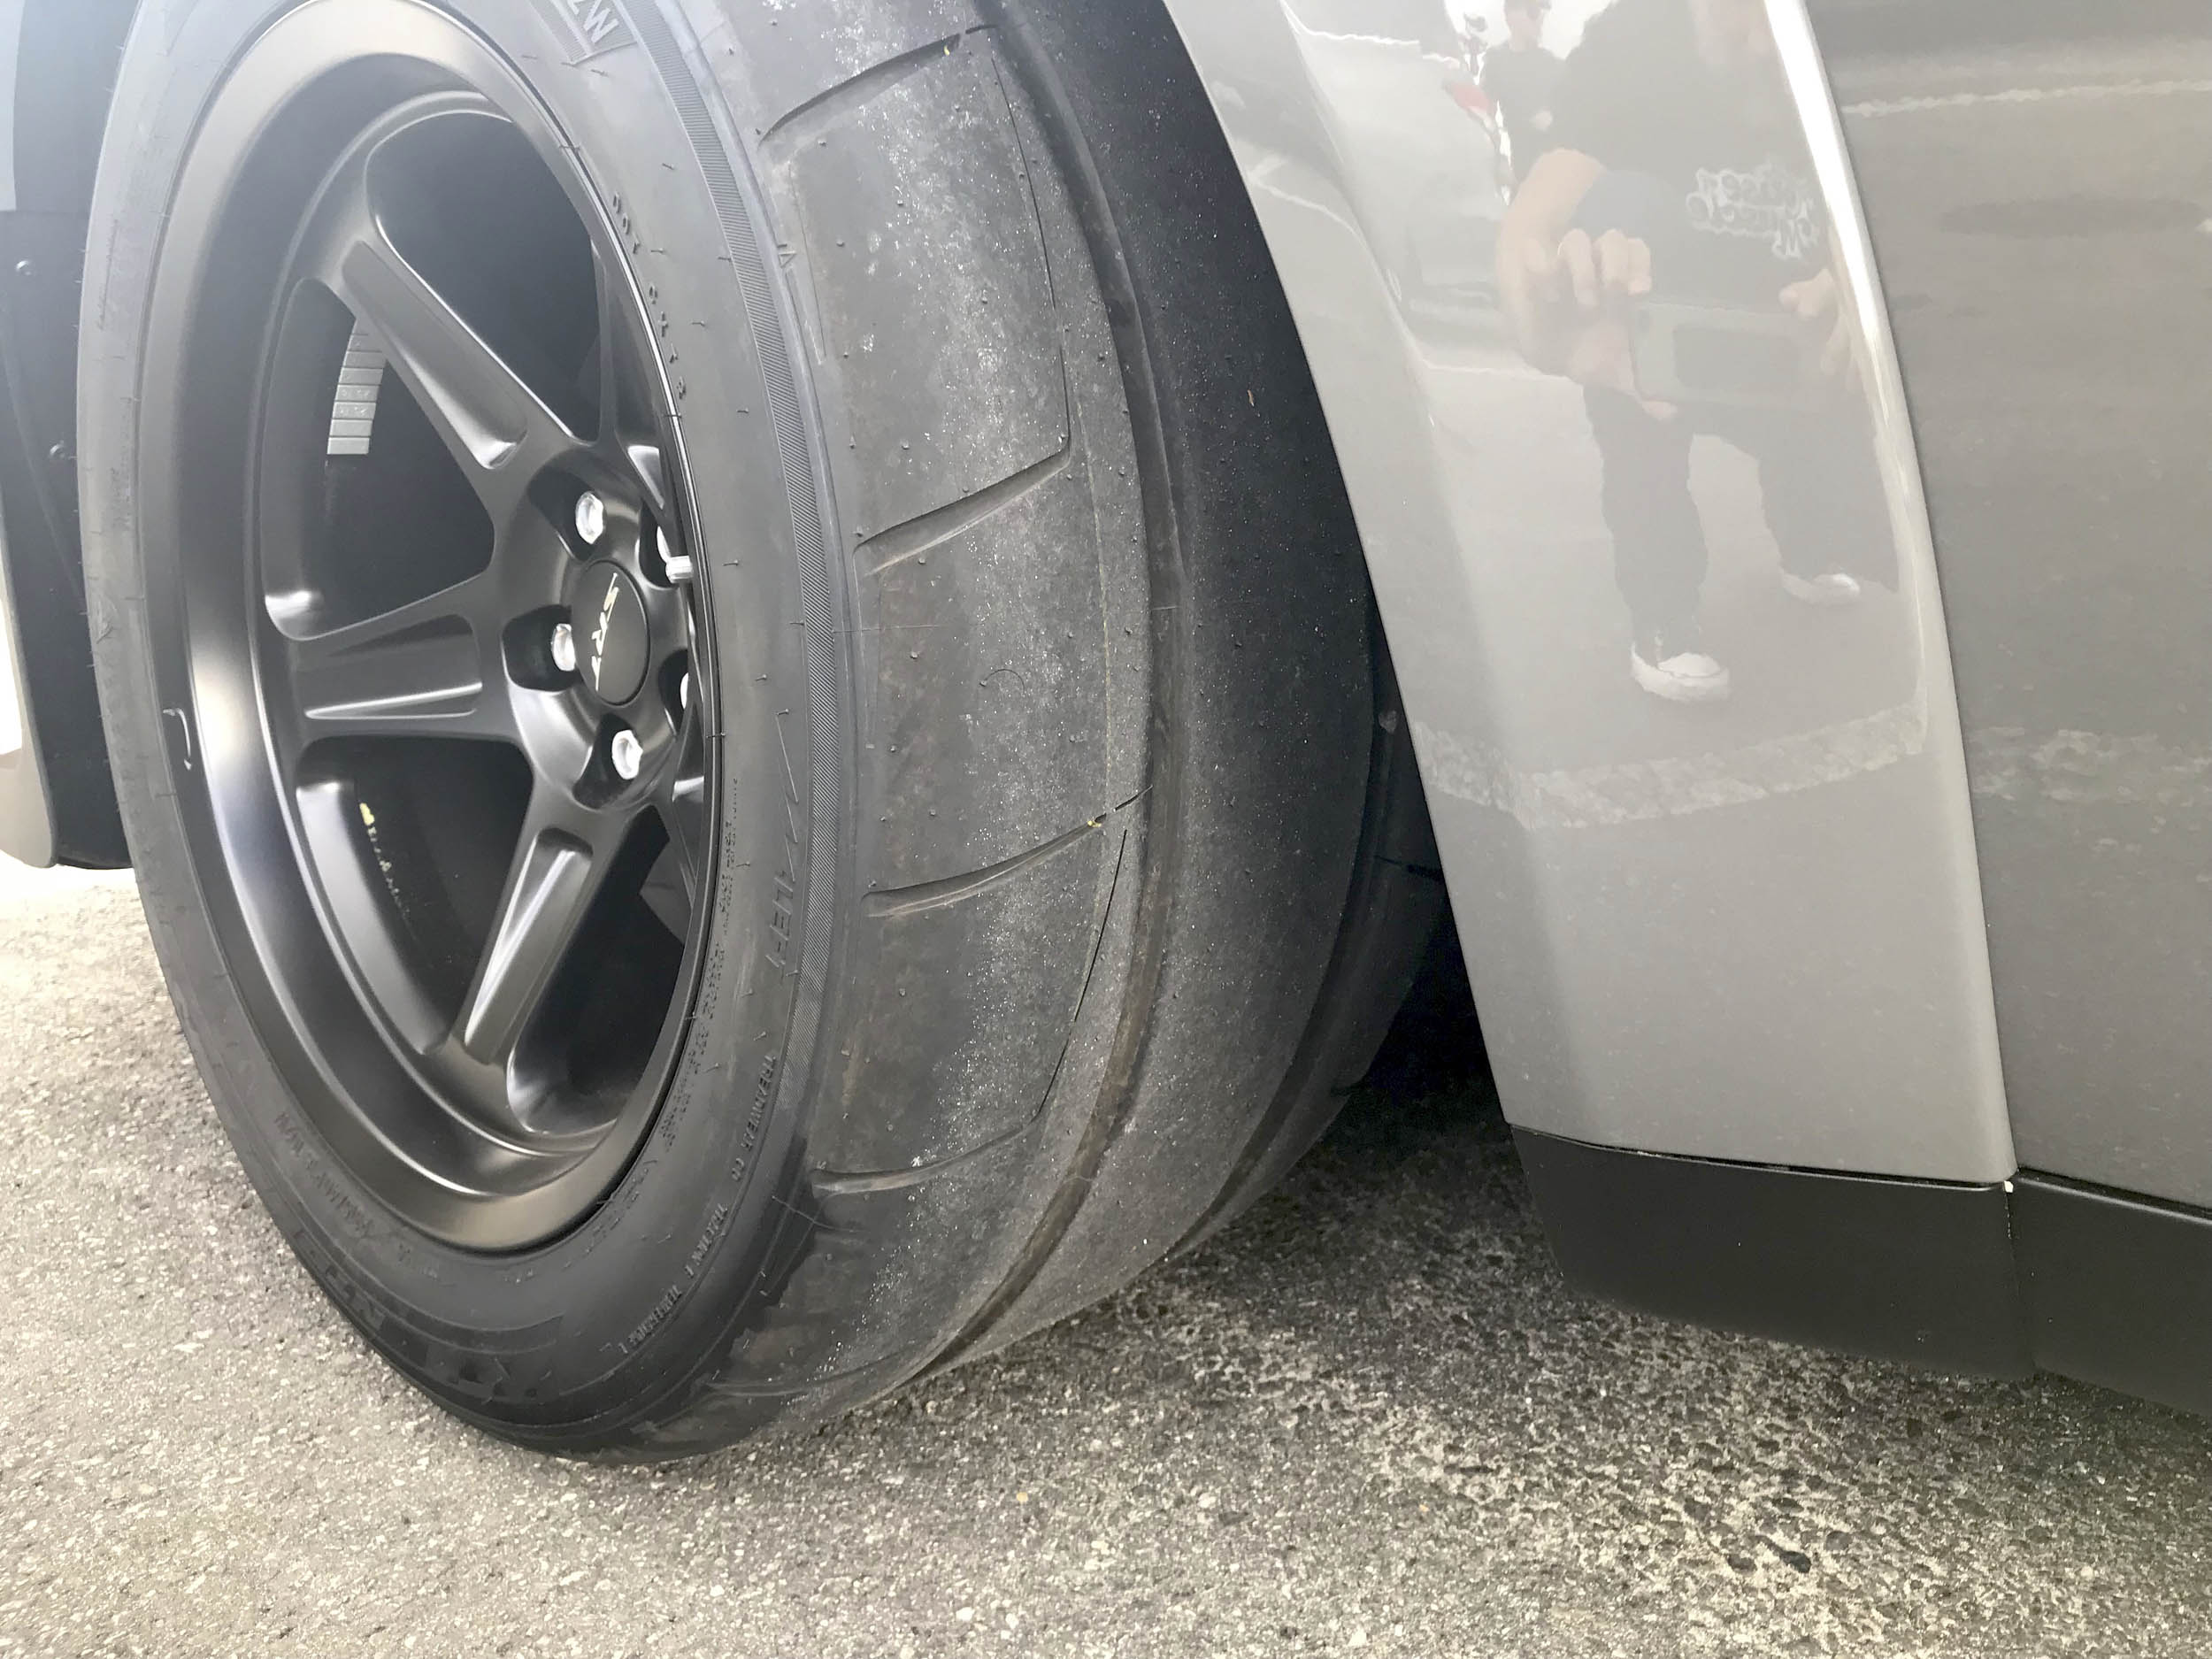 2018 Dodge Challenger SRT Demon tire